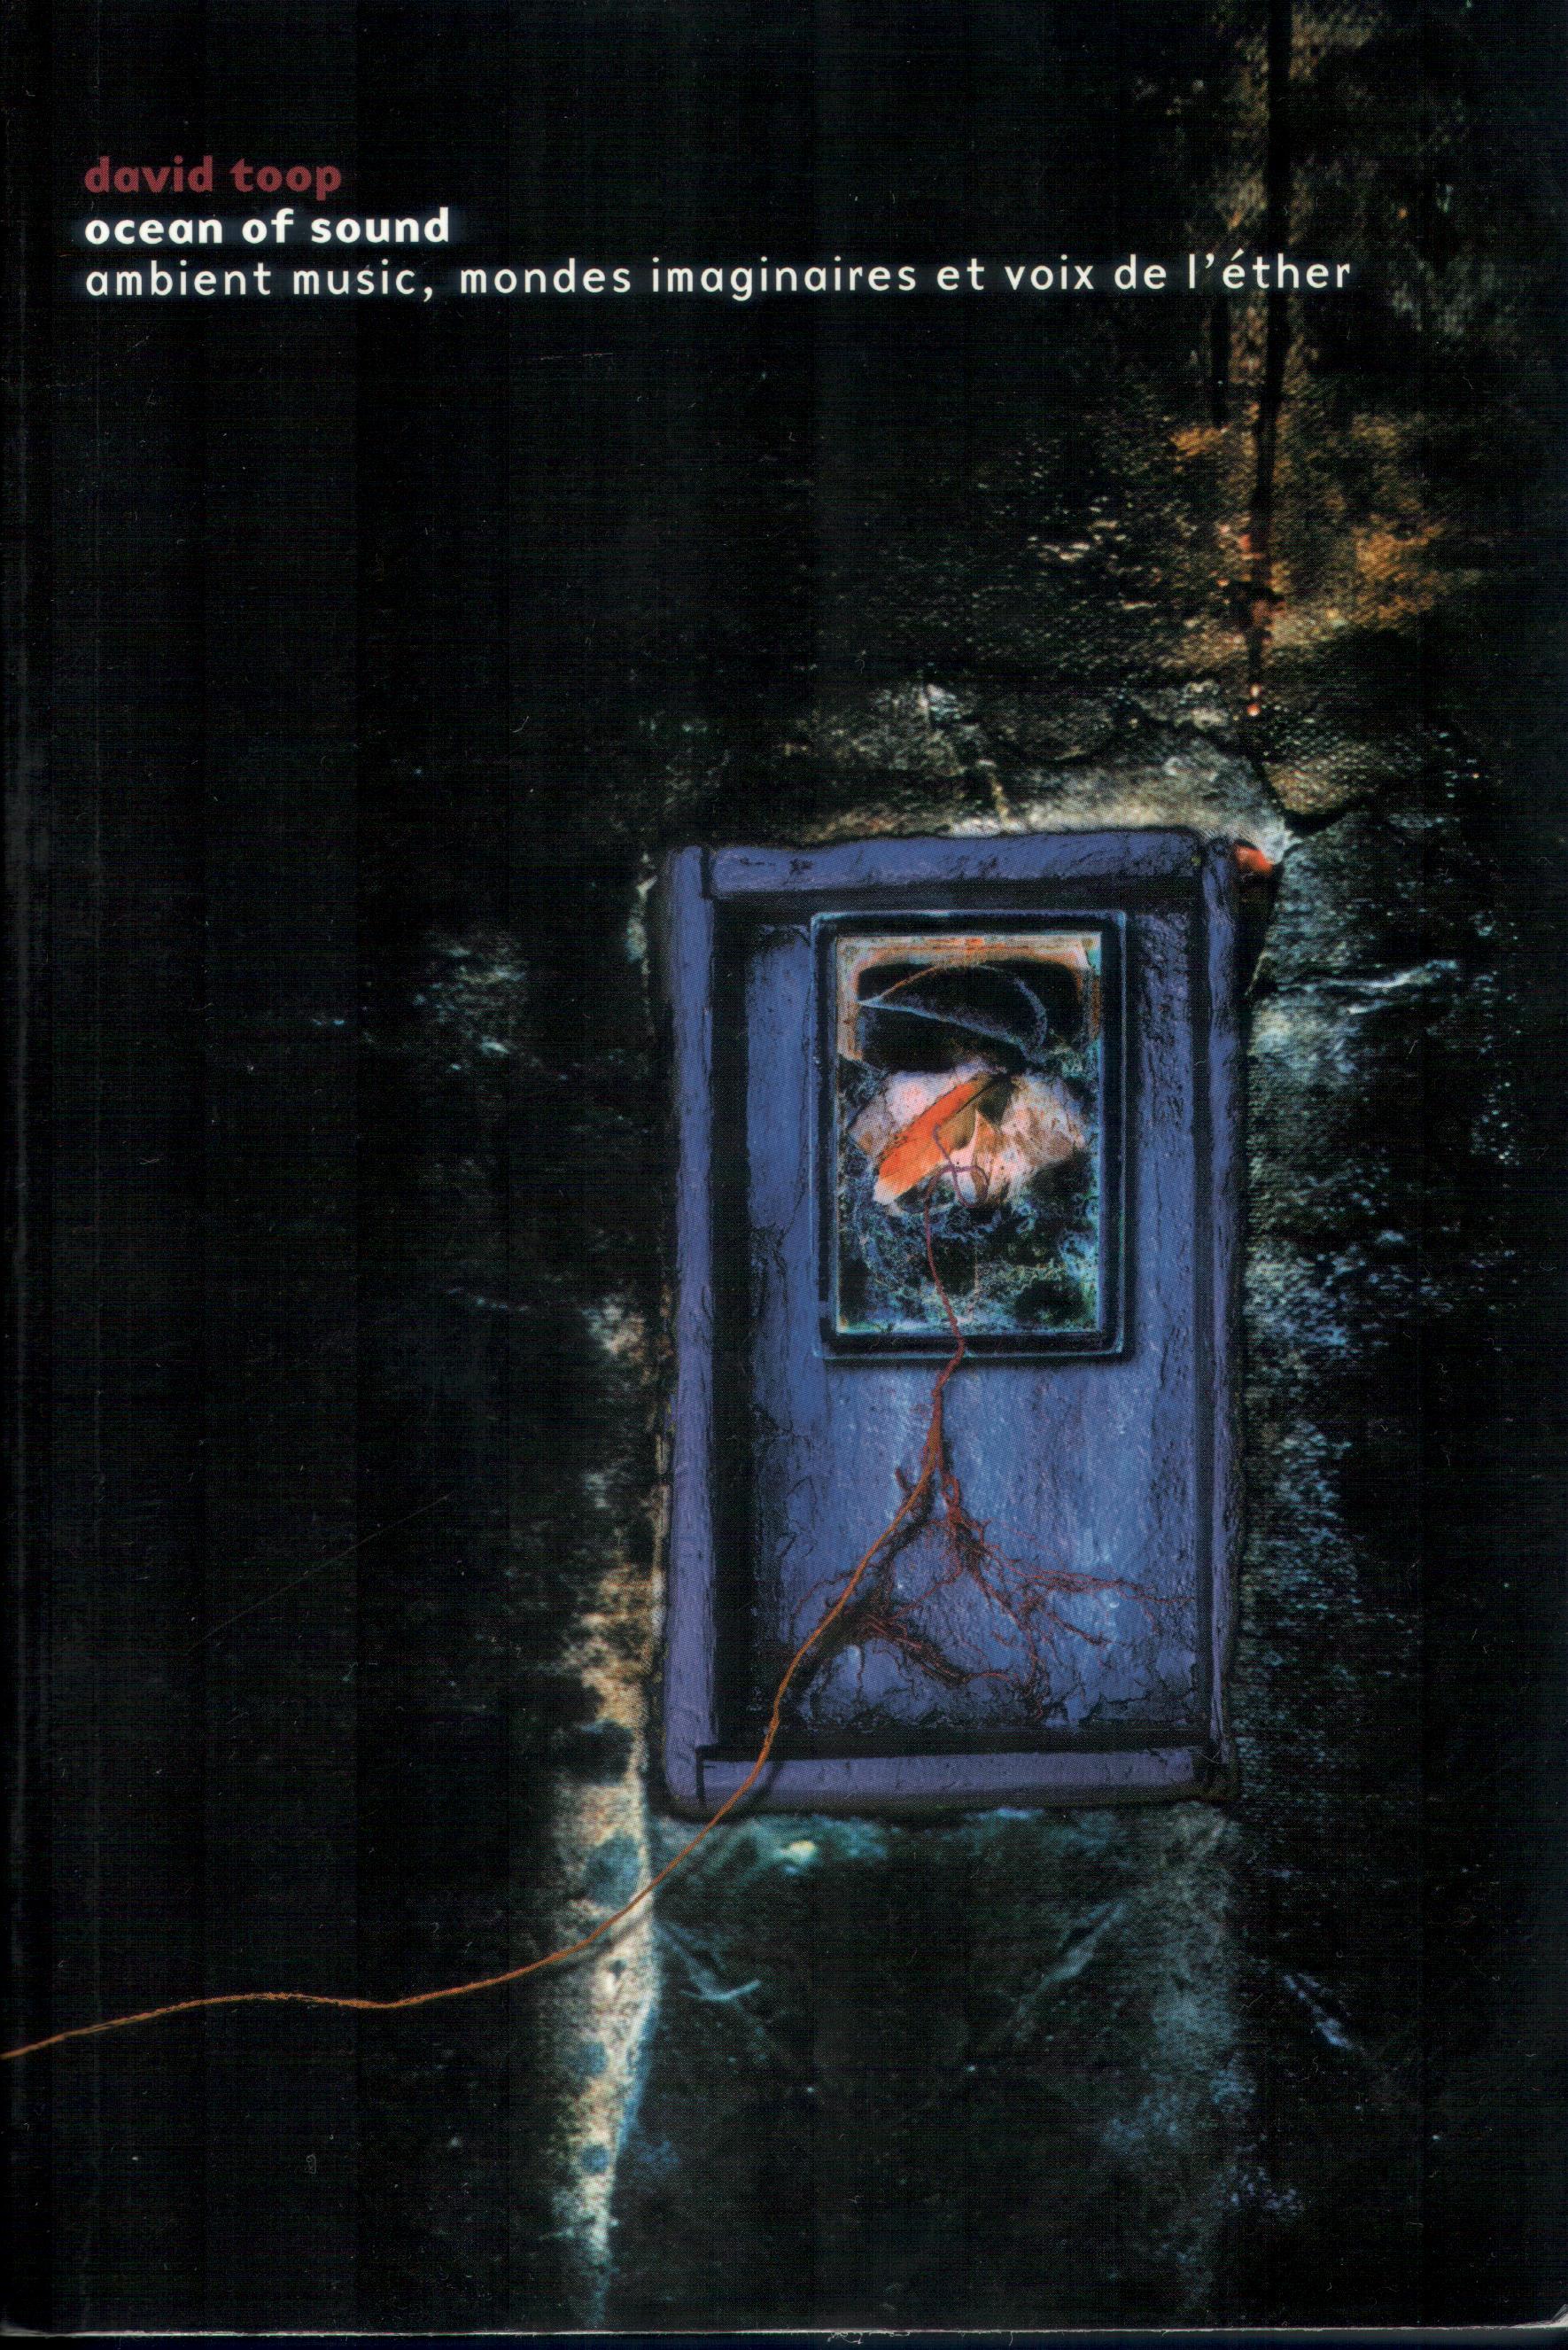 OCEAN OF SOUND - AMBIENT MUSIC, MONDES IMAGINAIRES